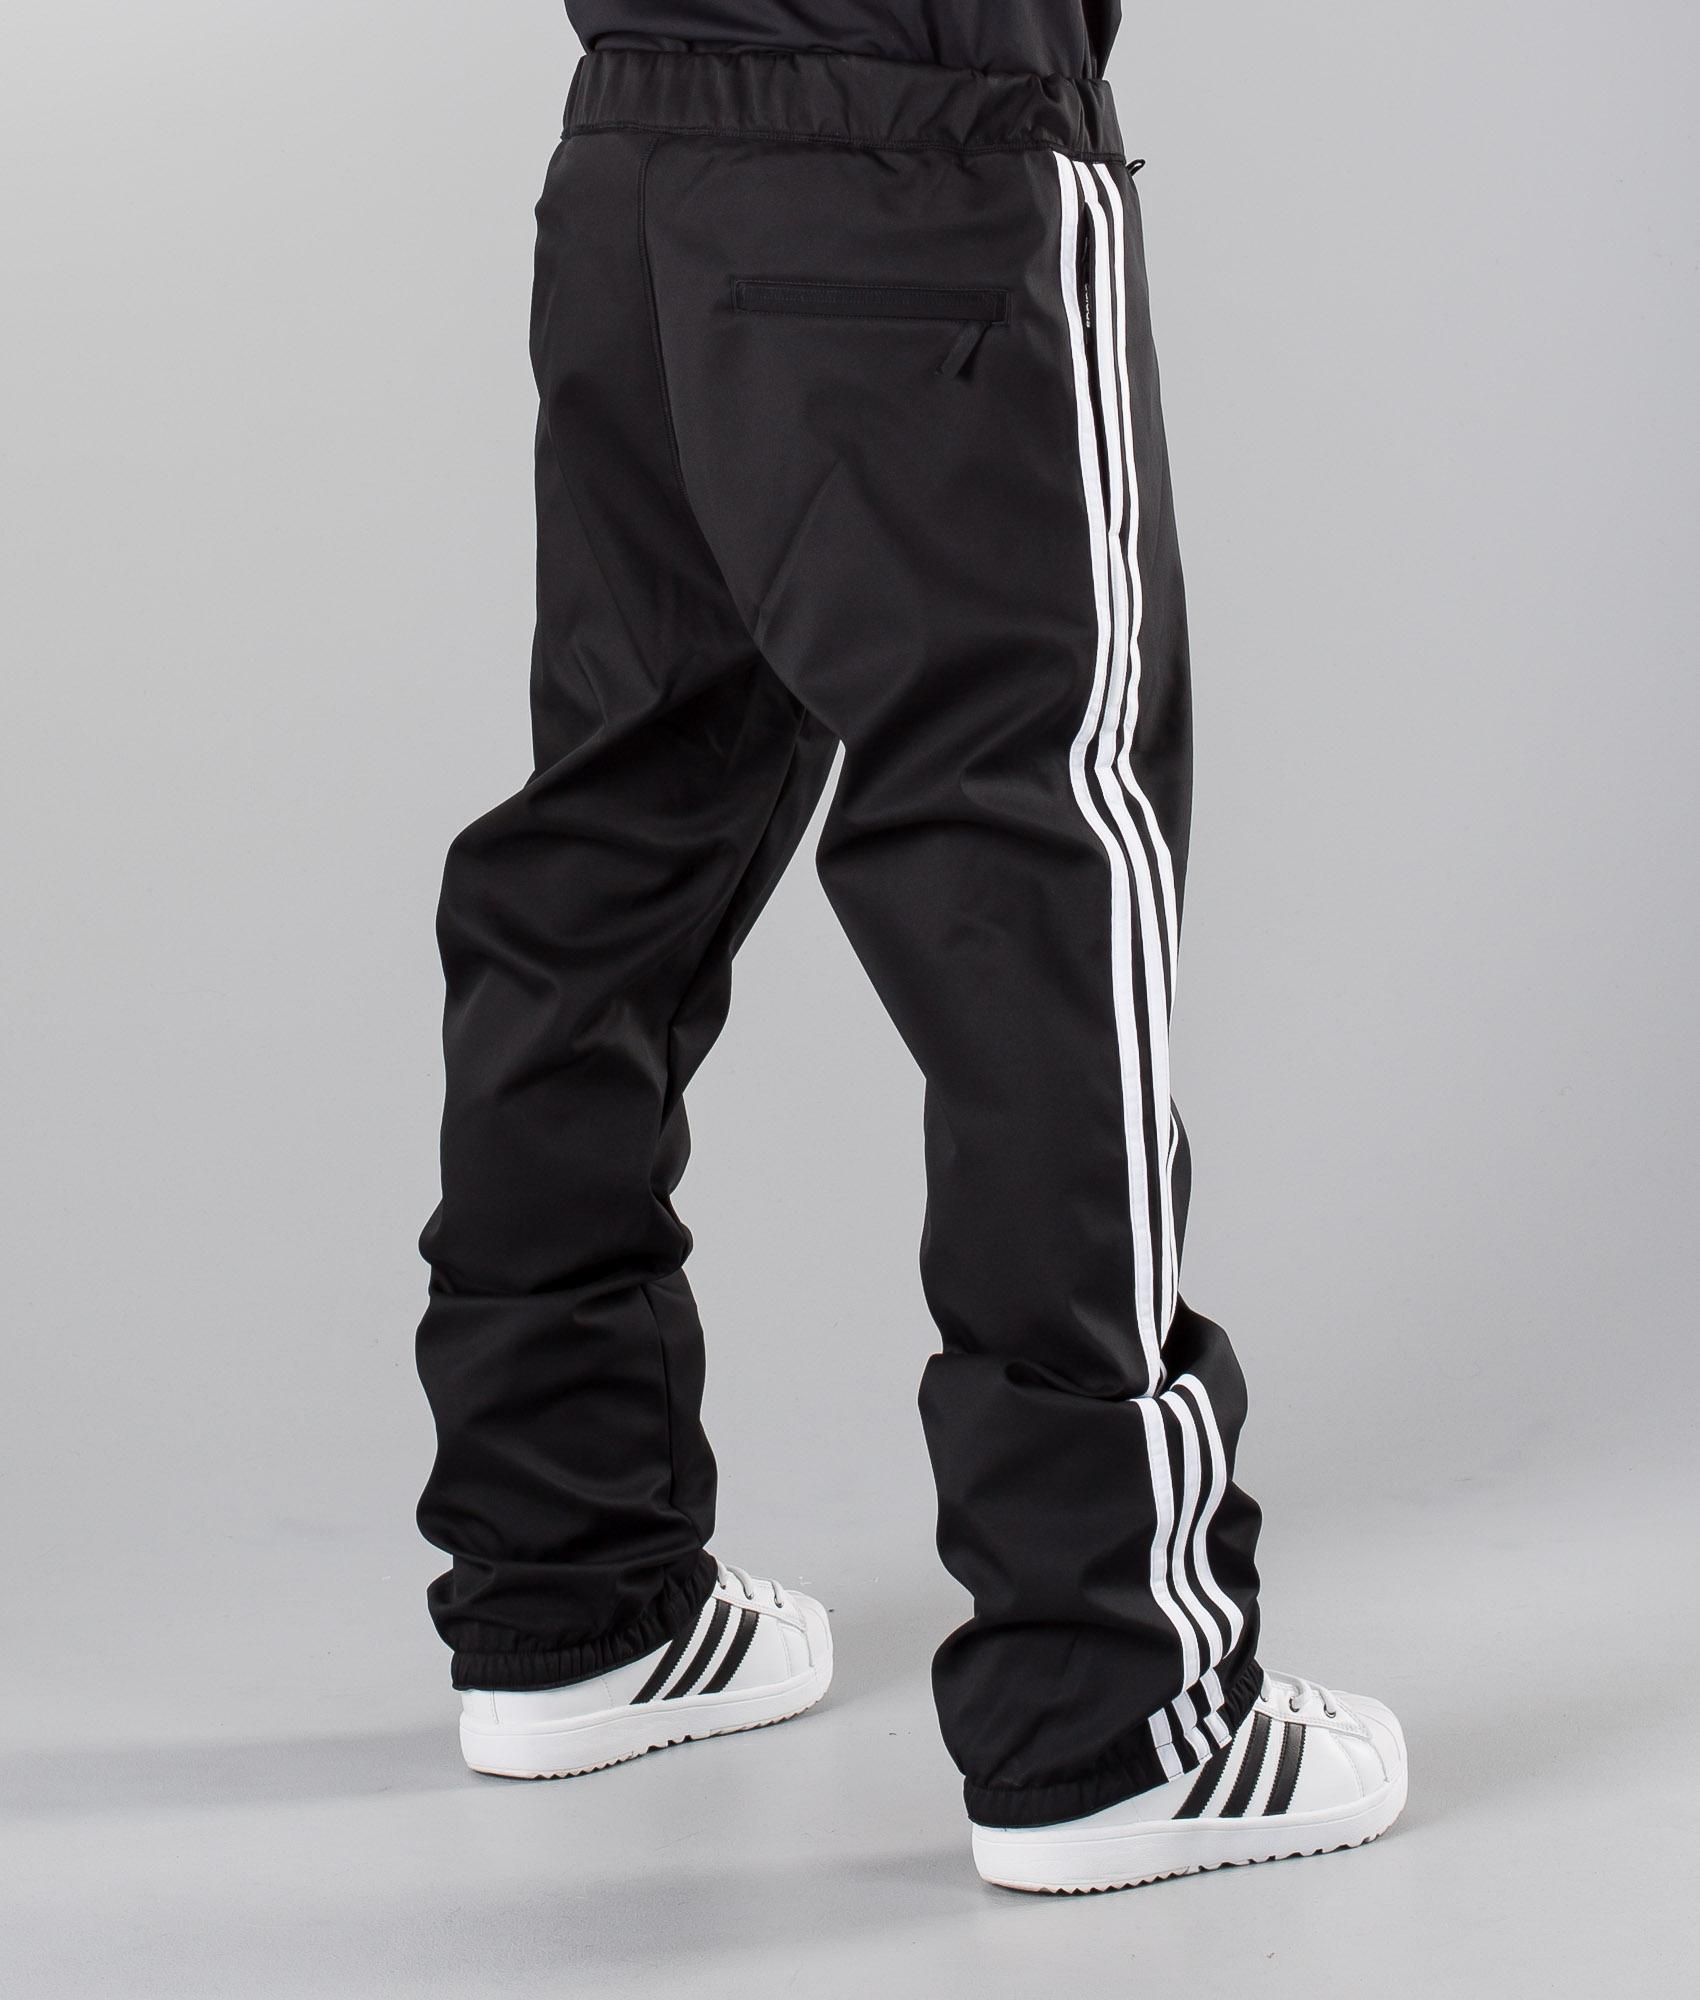 pantaloni da sci adidas